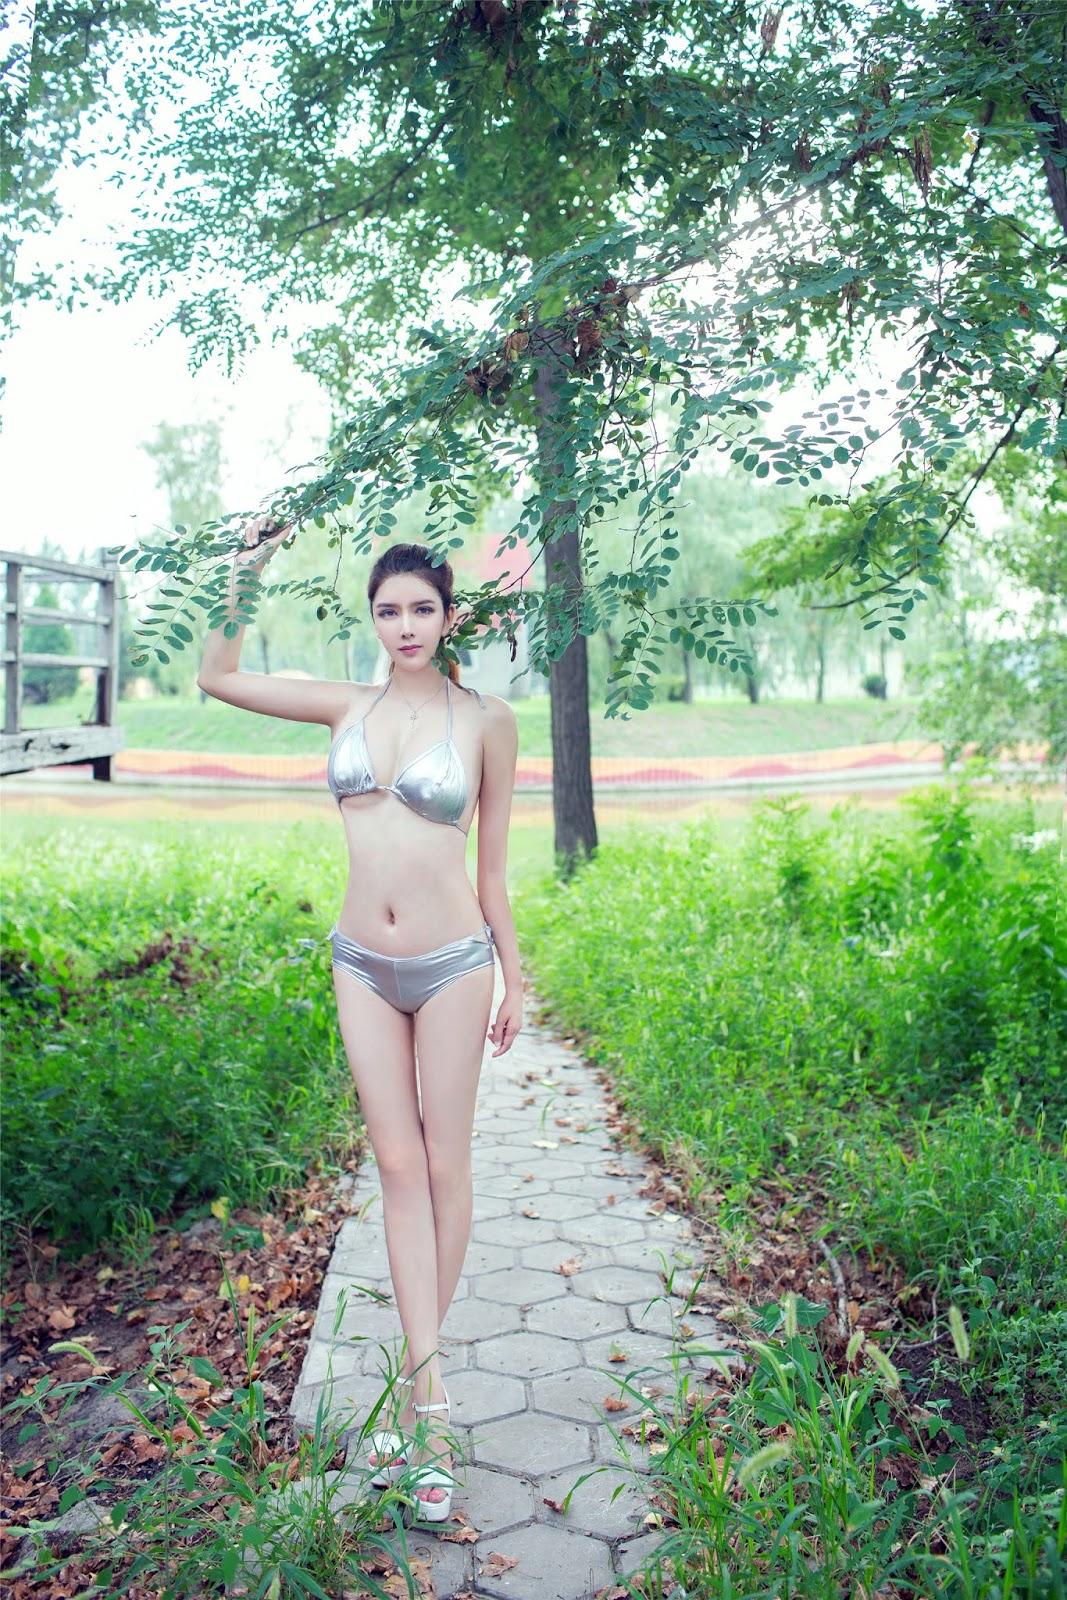 BoolWowGirls%2B%252835%2529 - Li LiSha 李丽莎 Beautiful Nude Model